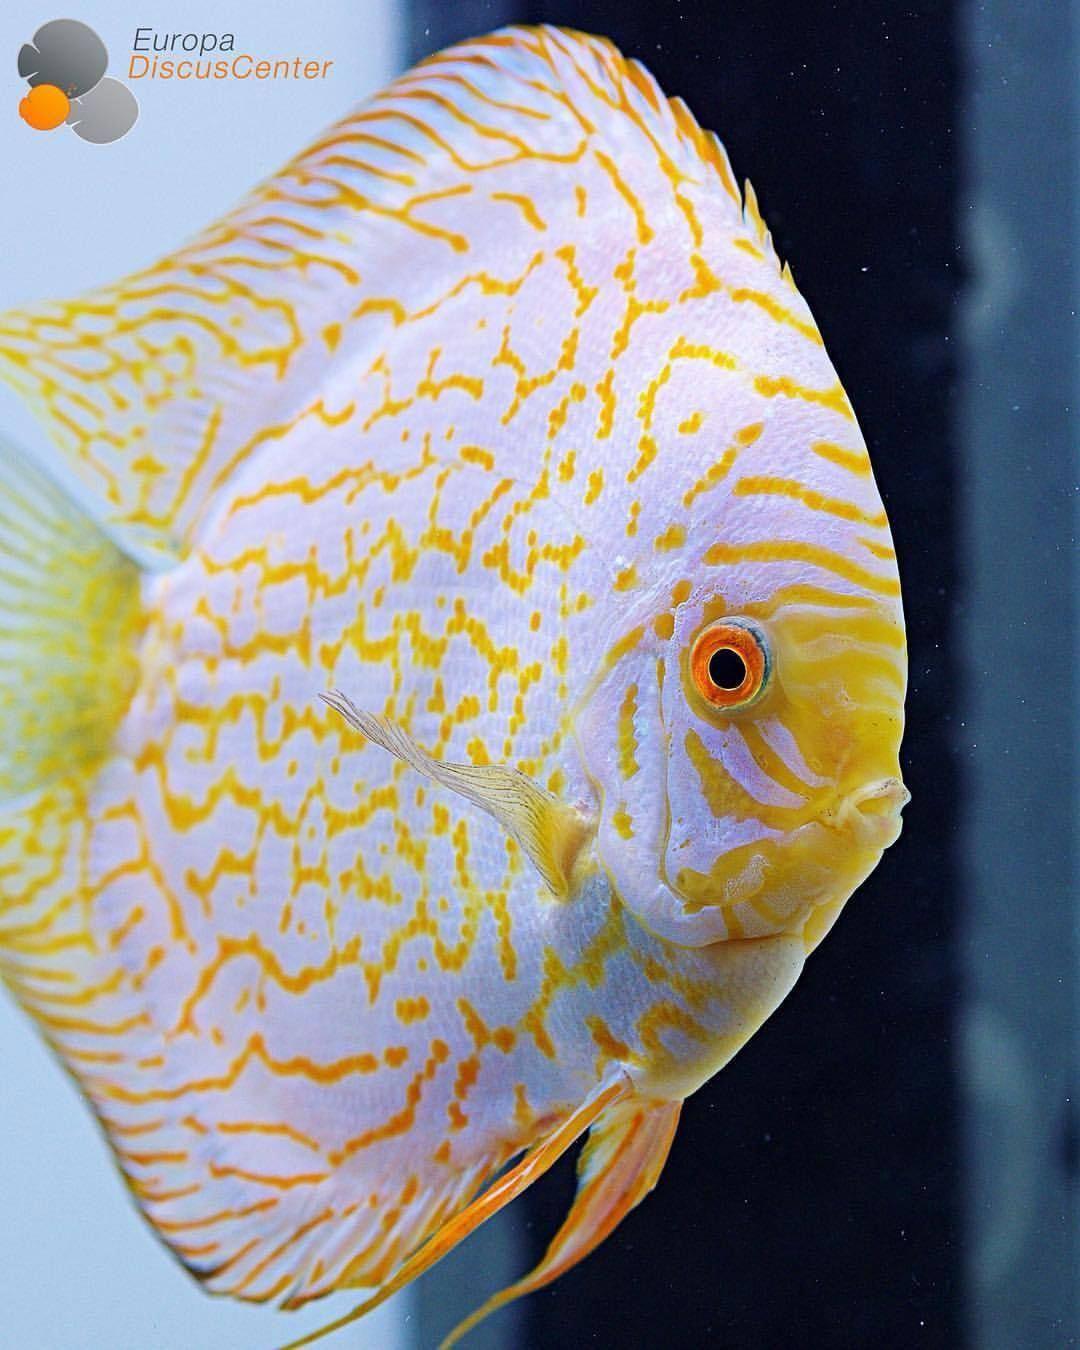 Golden Checkerboard Pigeon Discus Male Discus Diskus Diskusfische Aquarium Symphysodon Tropicalfish Discus Aquarium Fish Discus Fish Tropical Fish